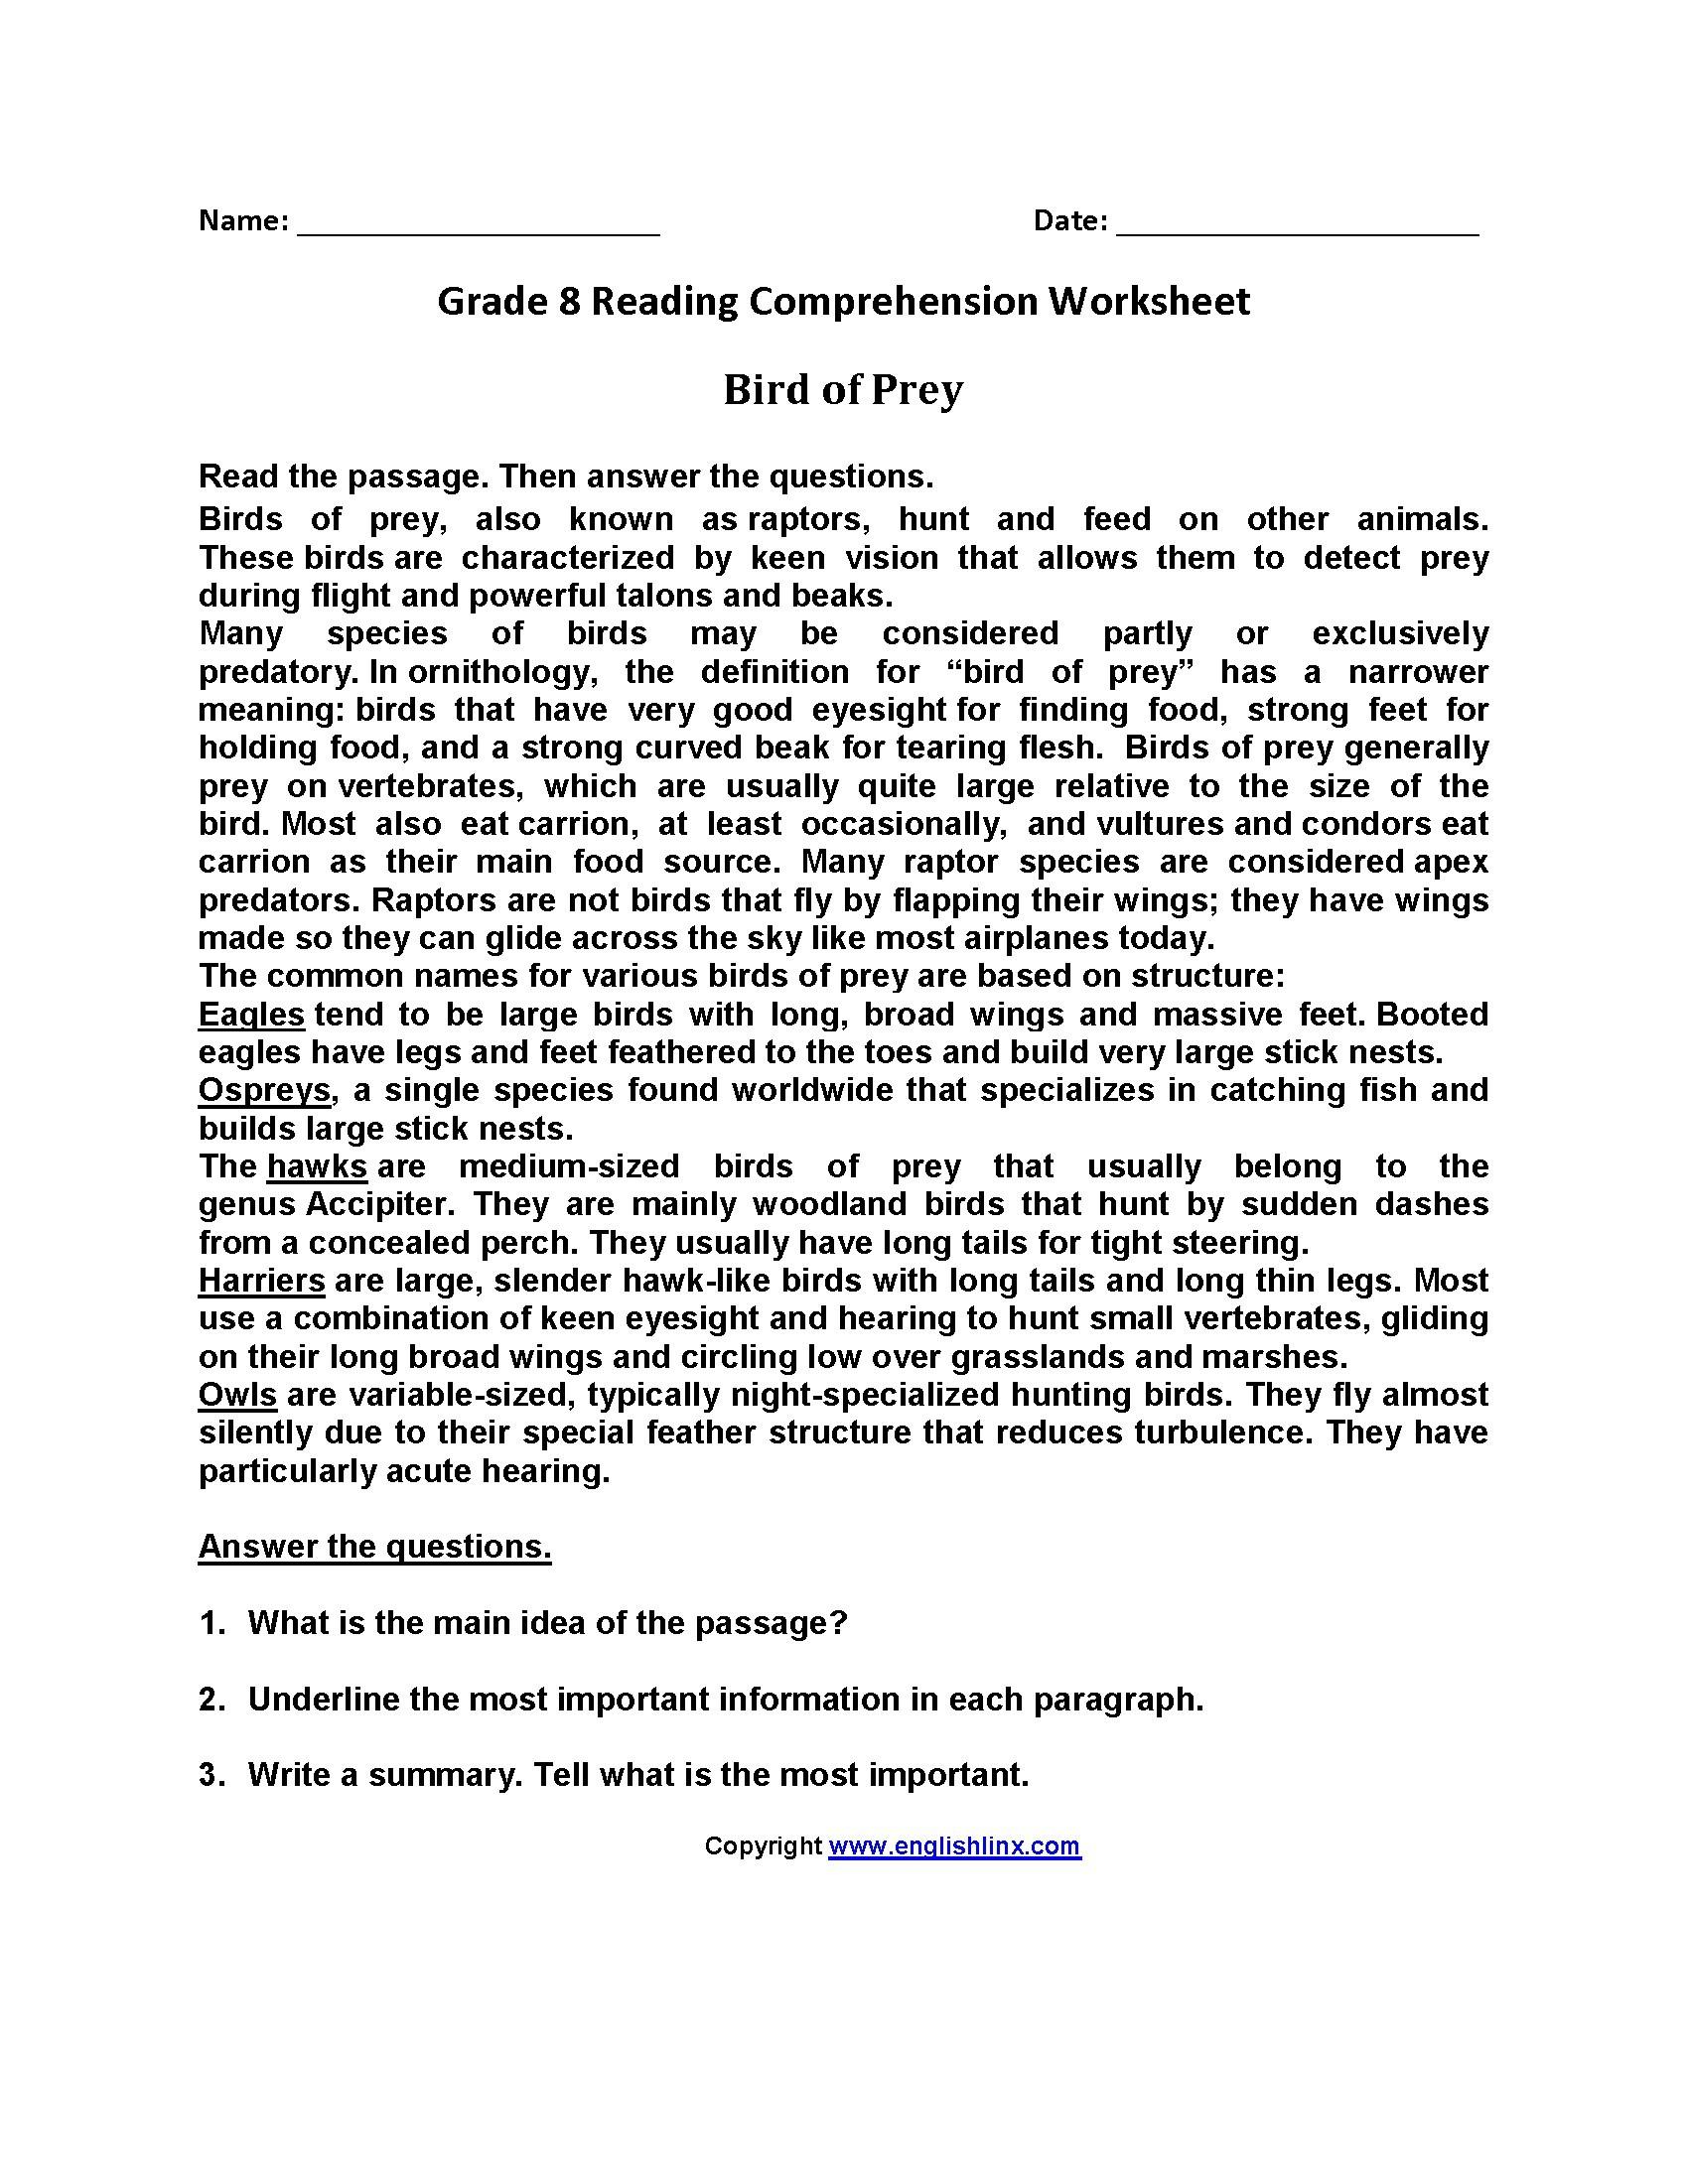 Free Printable Reading Comprehension Worksheets 3Rd Grade For - Free Printable Reading Comprehension Worksheets